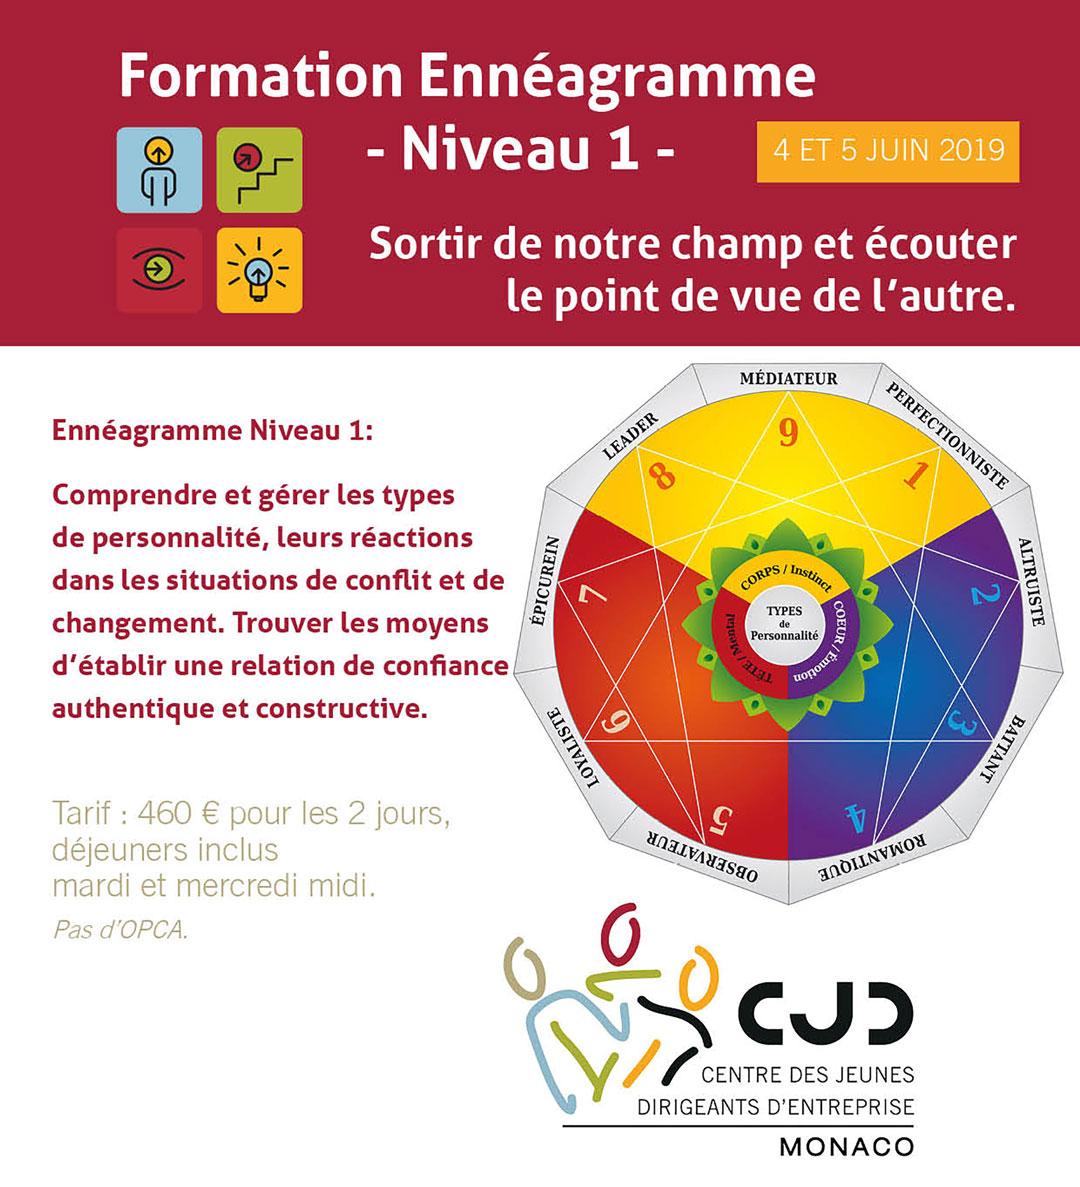 Formation Ennéagramme CJD Monaco  - Niveau 1 -